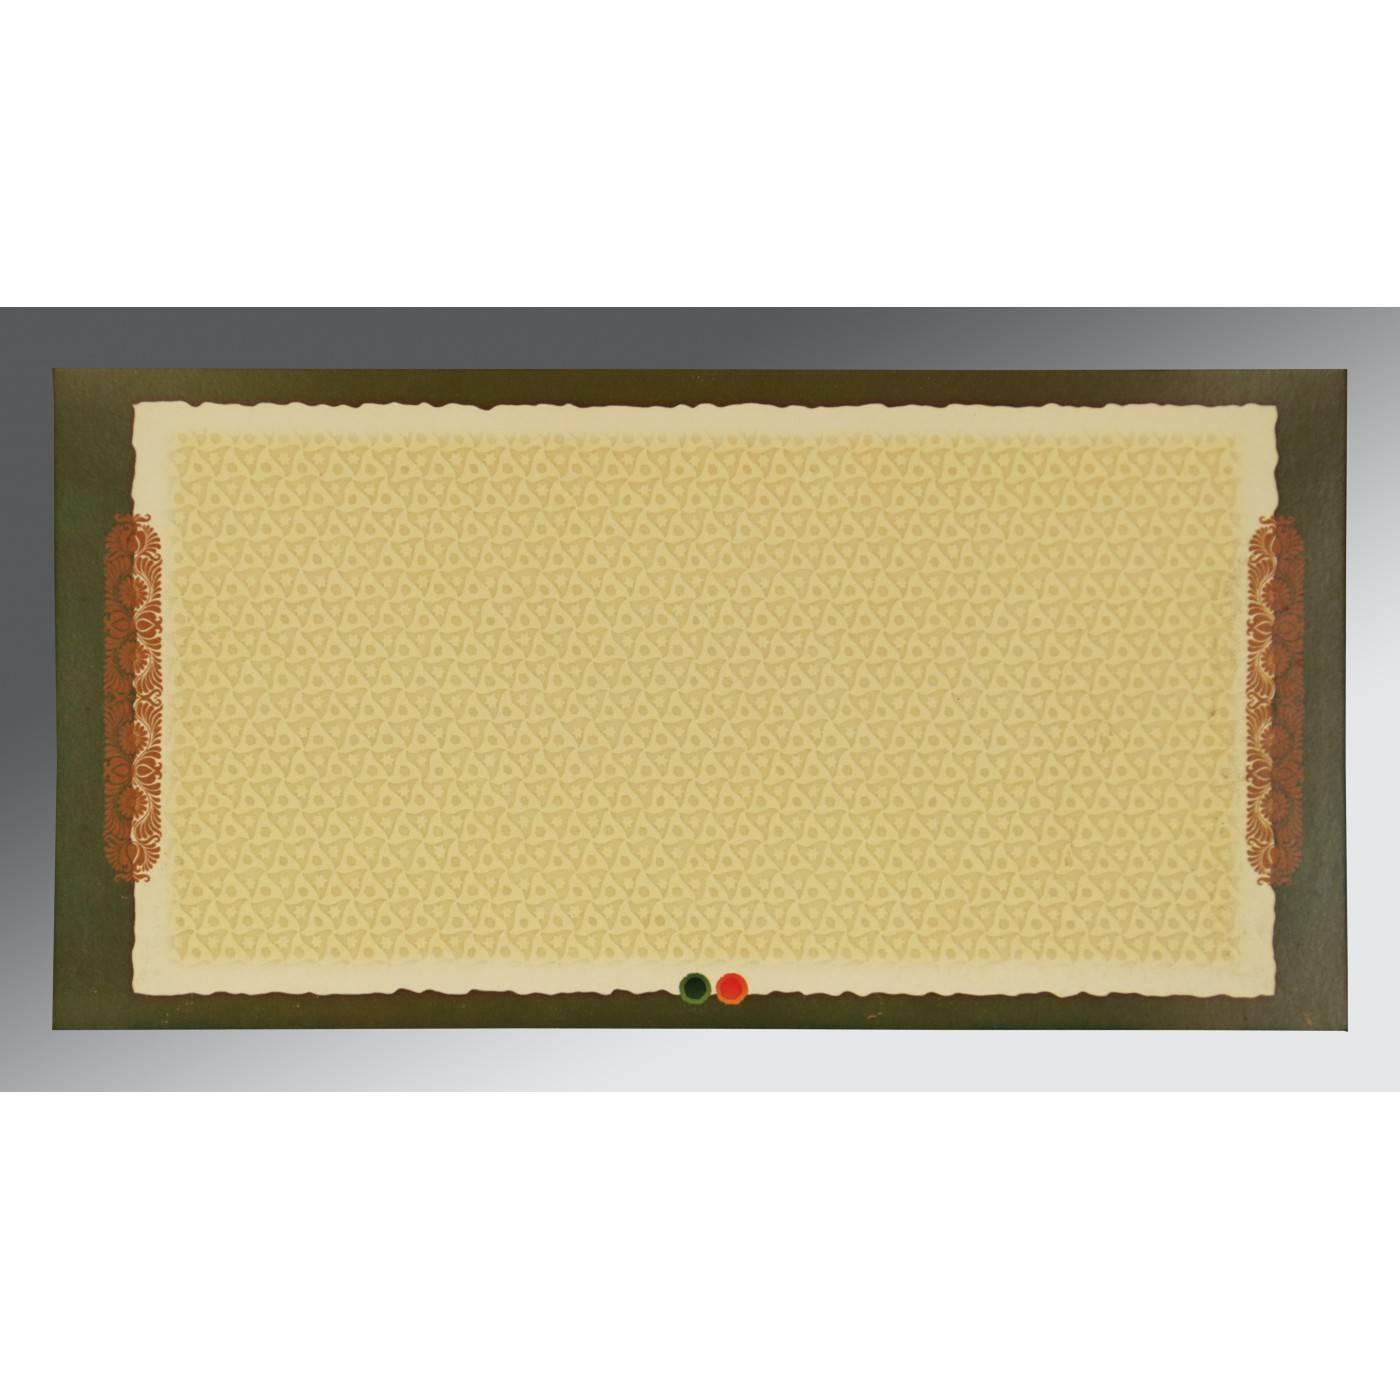 DARK RED MATTE OFFSET PRINTED WEDDING CARD : CW-2215 - IndianWeddingCards